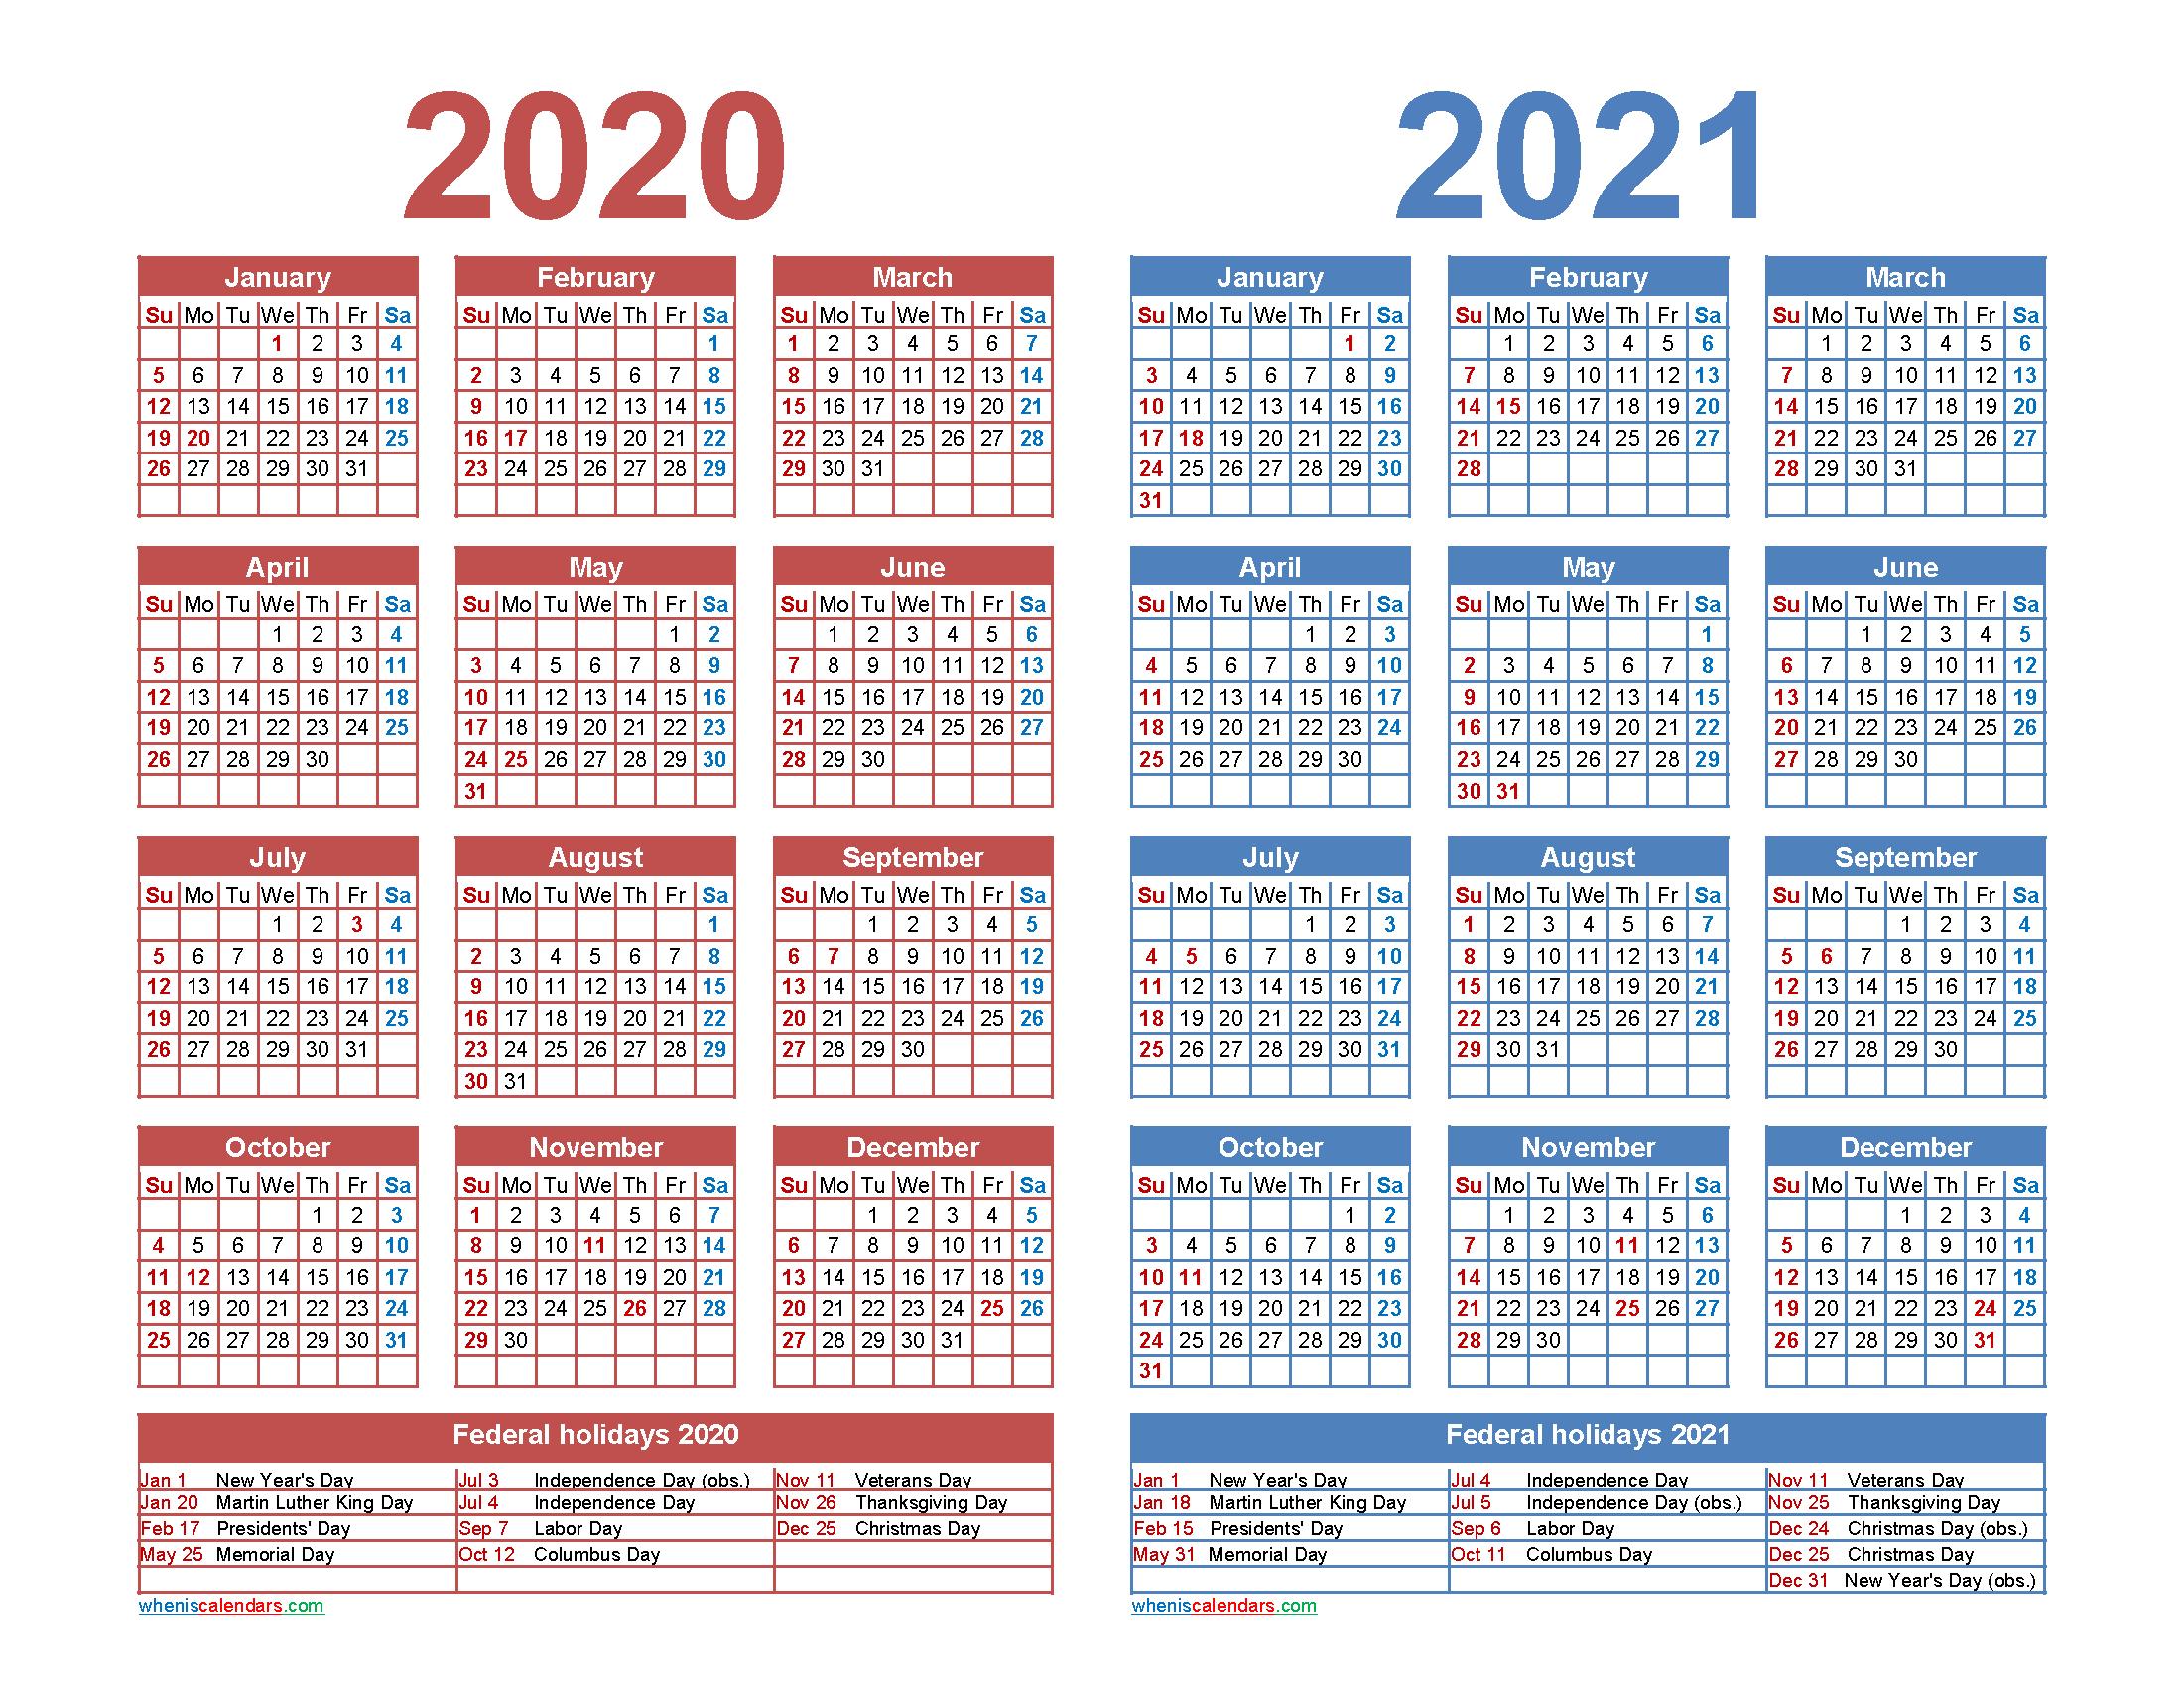 Free 2020 and 2021 Calendar Printable Word, PDF